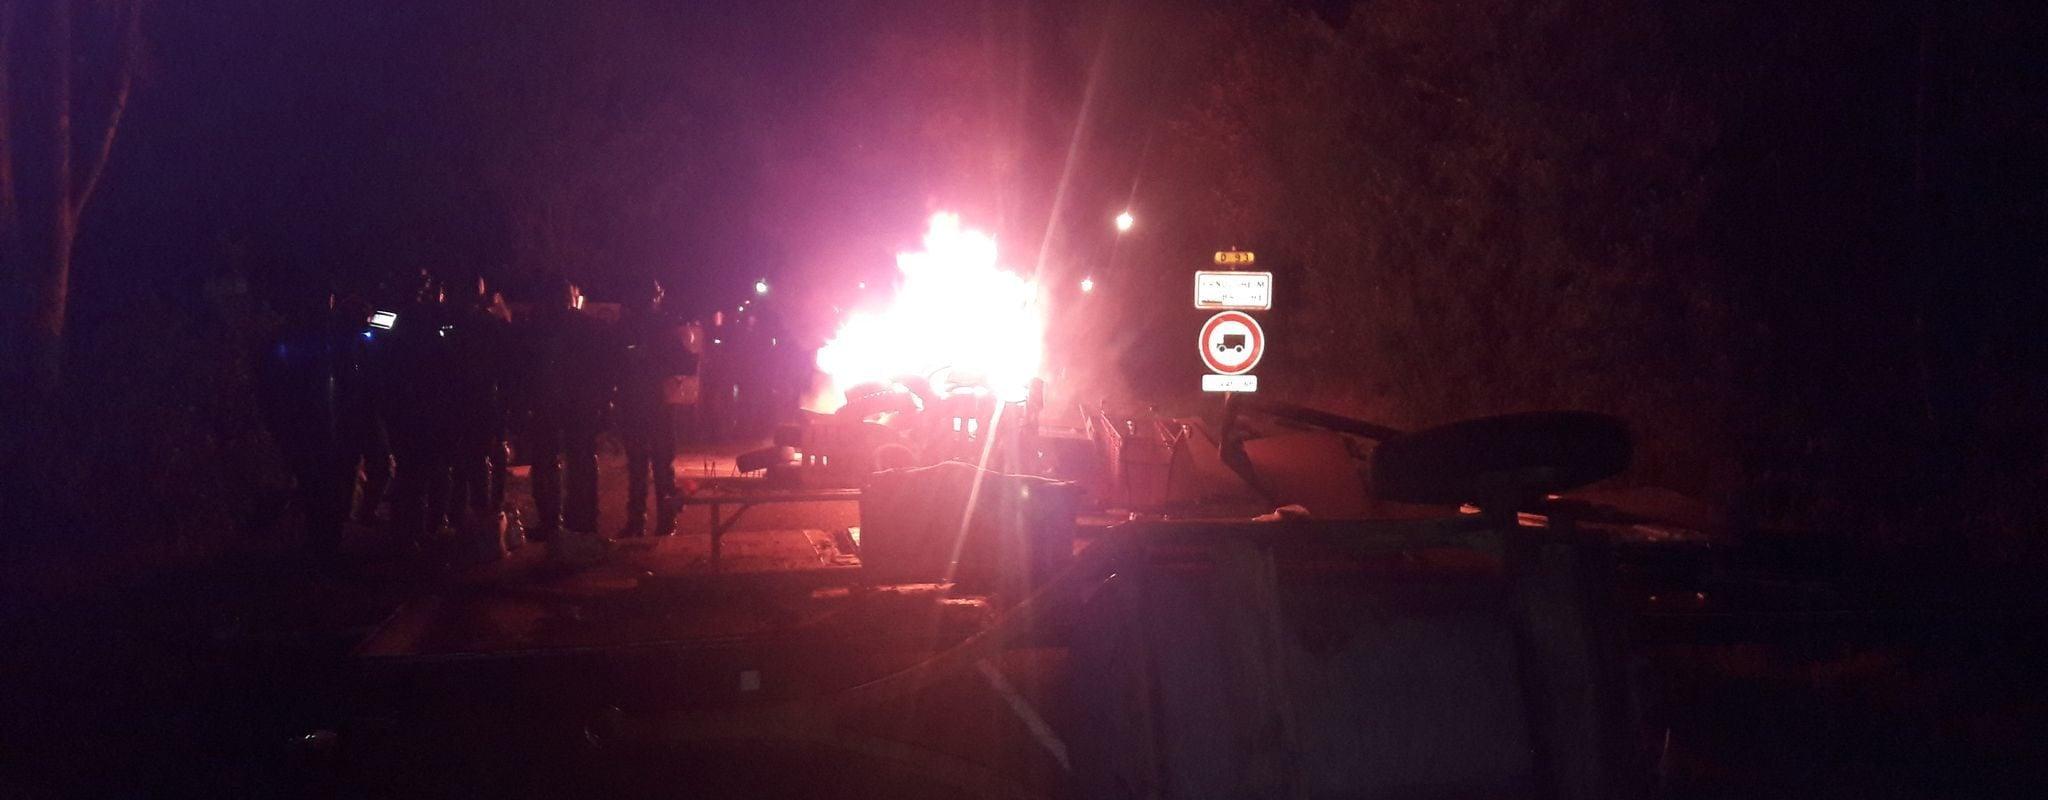 GCO : la ZAD de Kolbsheim a été évacuée lundi matin